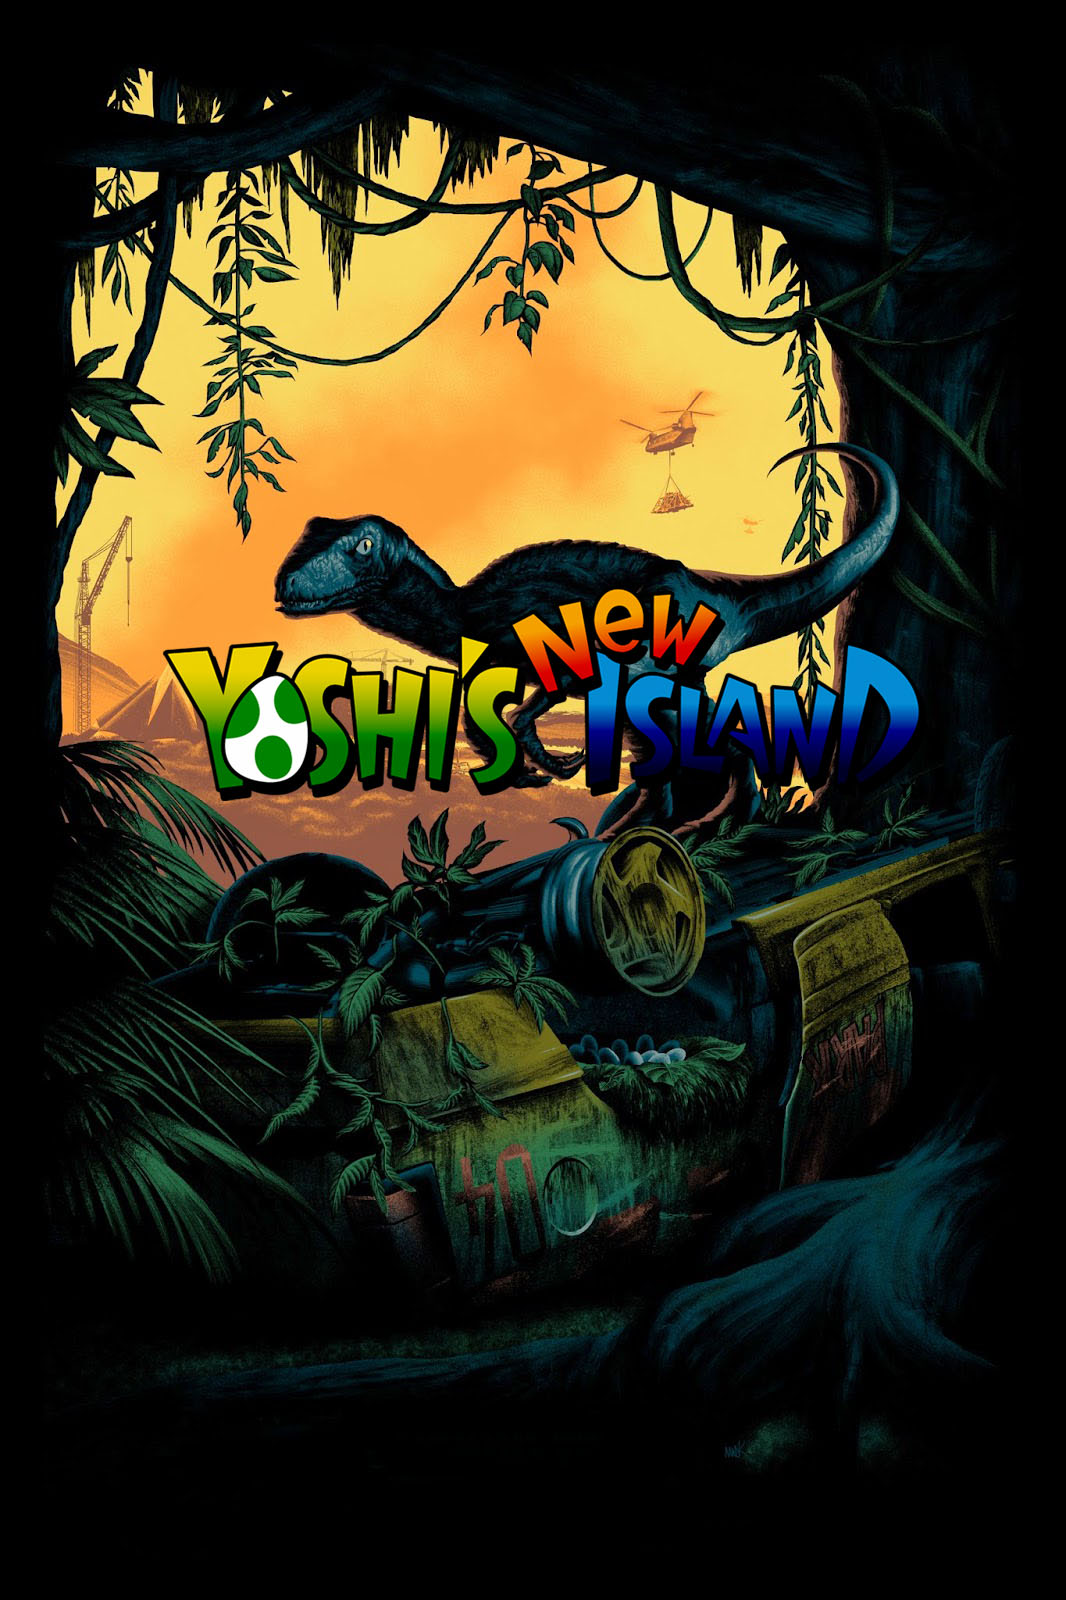 Jurassic-World-Yoshi-New-Island